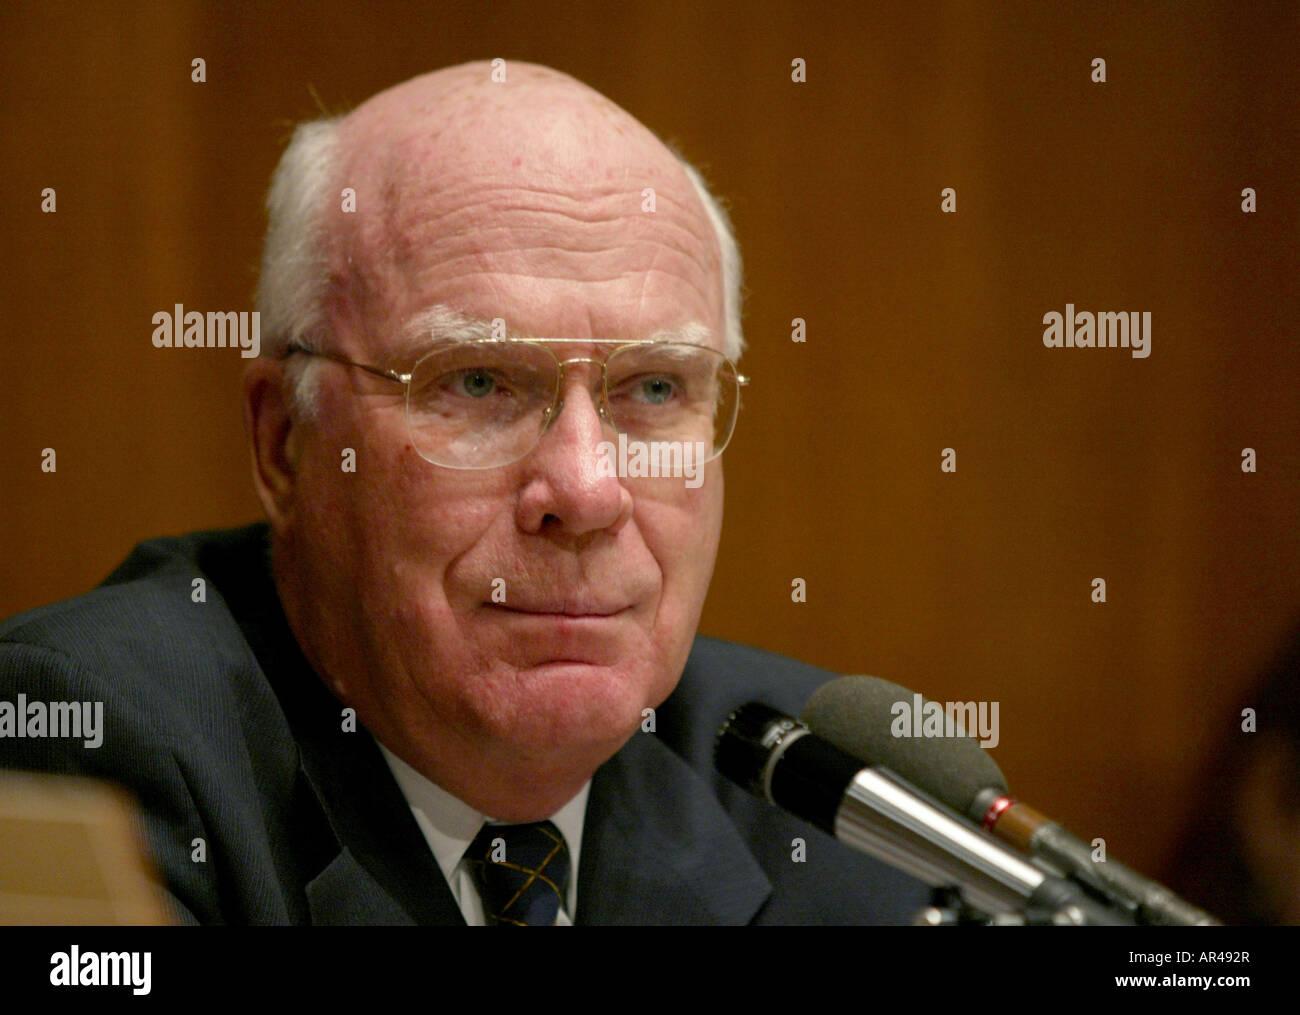 Washington DC 9/18/02 Senator Patrick Leahy listens during a hearing of the senate Judiciary Committee Stock Photo